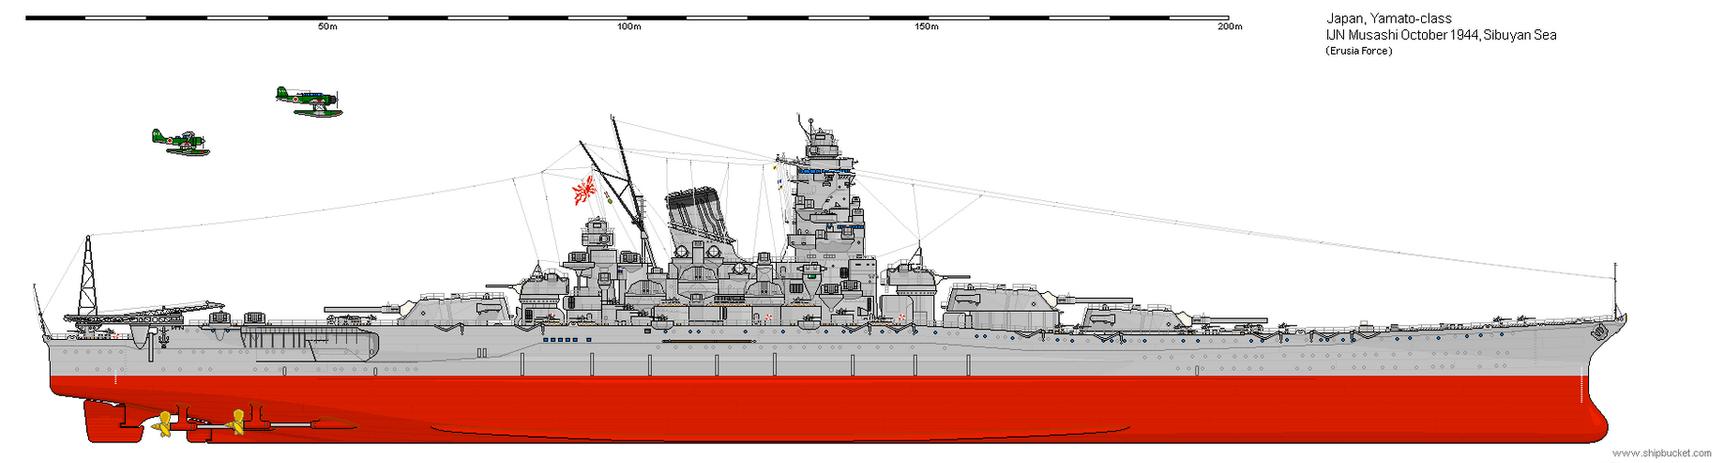 BB Musashi Sibuyan Sea Shipbucket by Erusia-Force